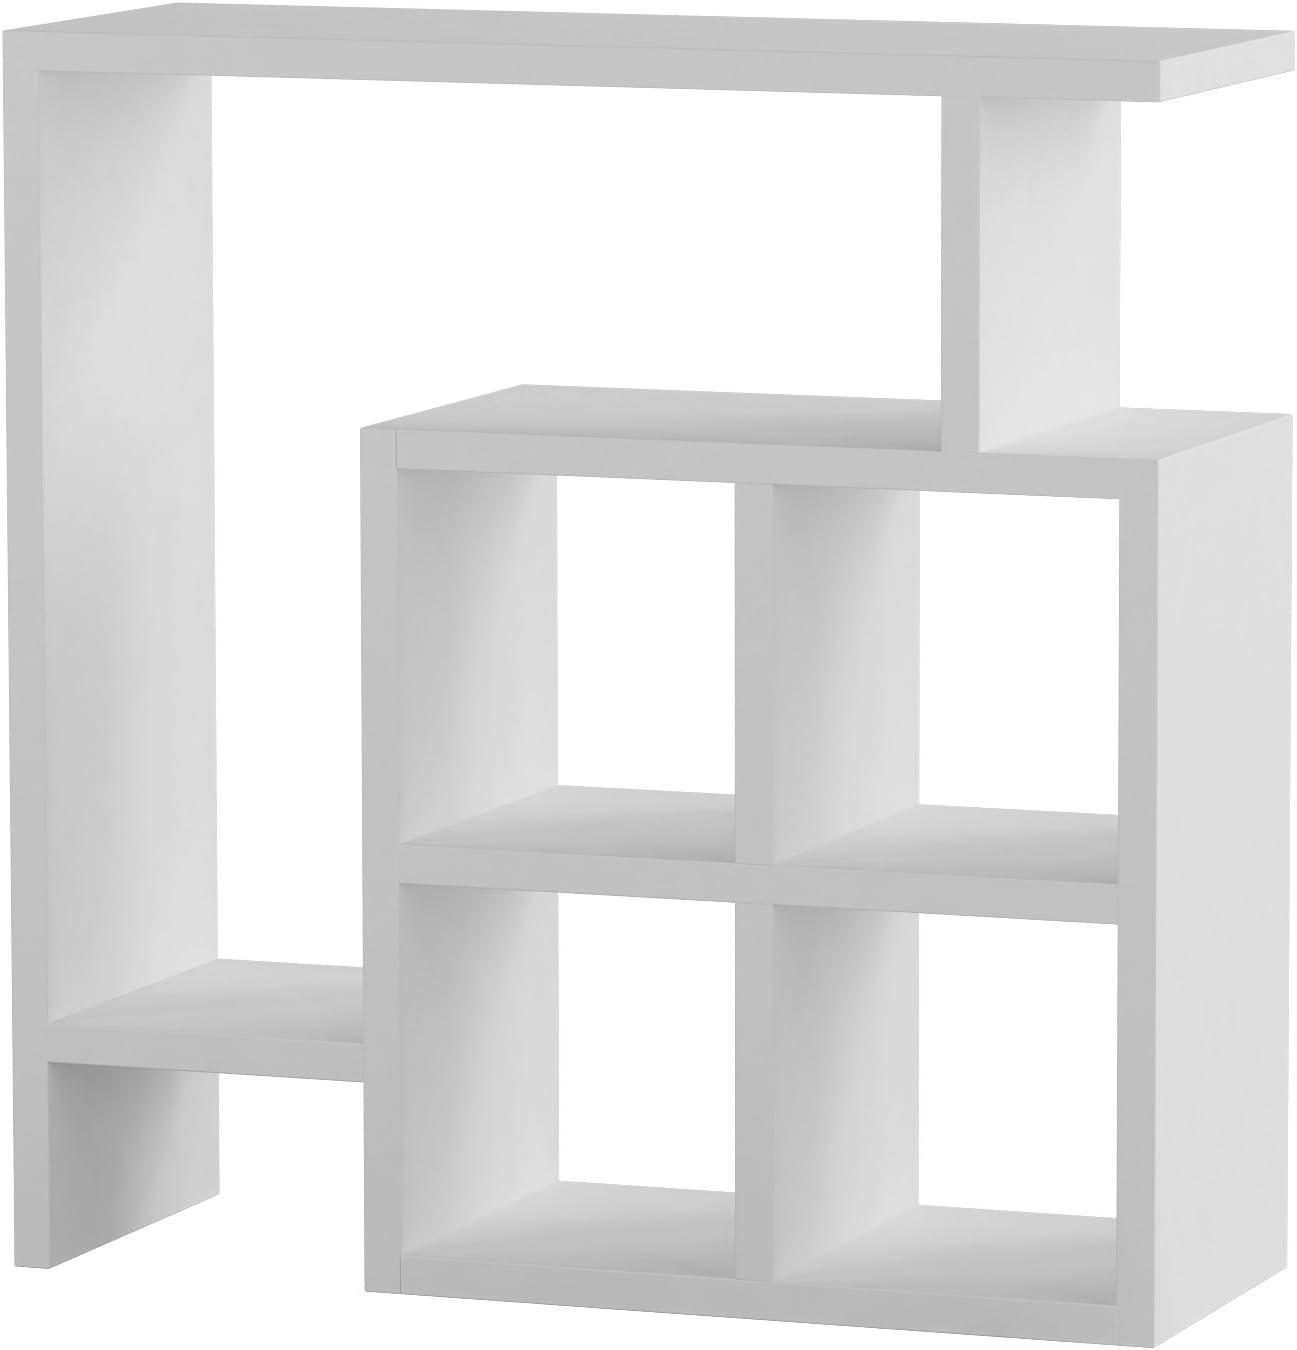 Ada Home Décor Smith Side Table, 22'' x 22'' x 8'', White